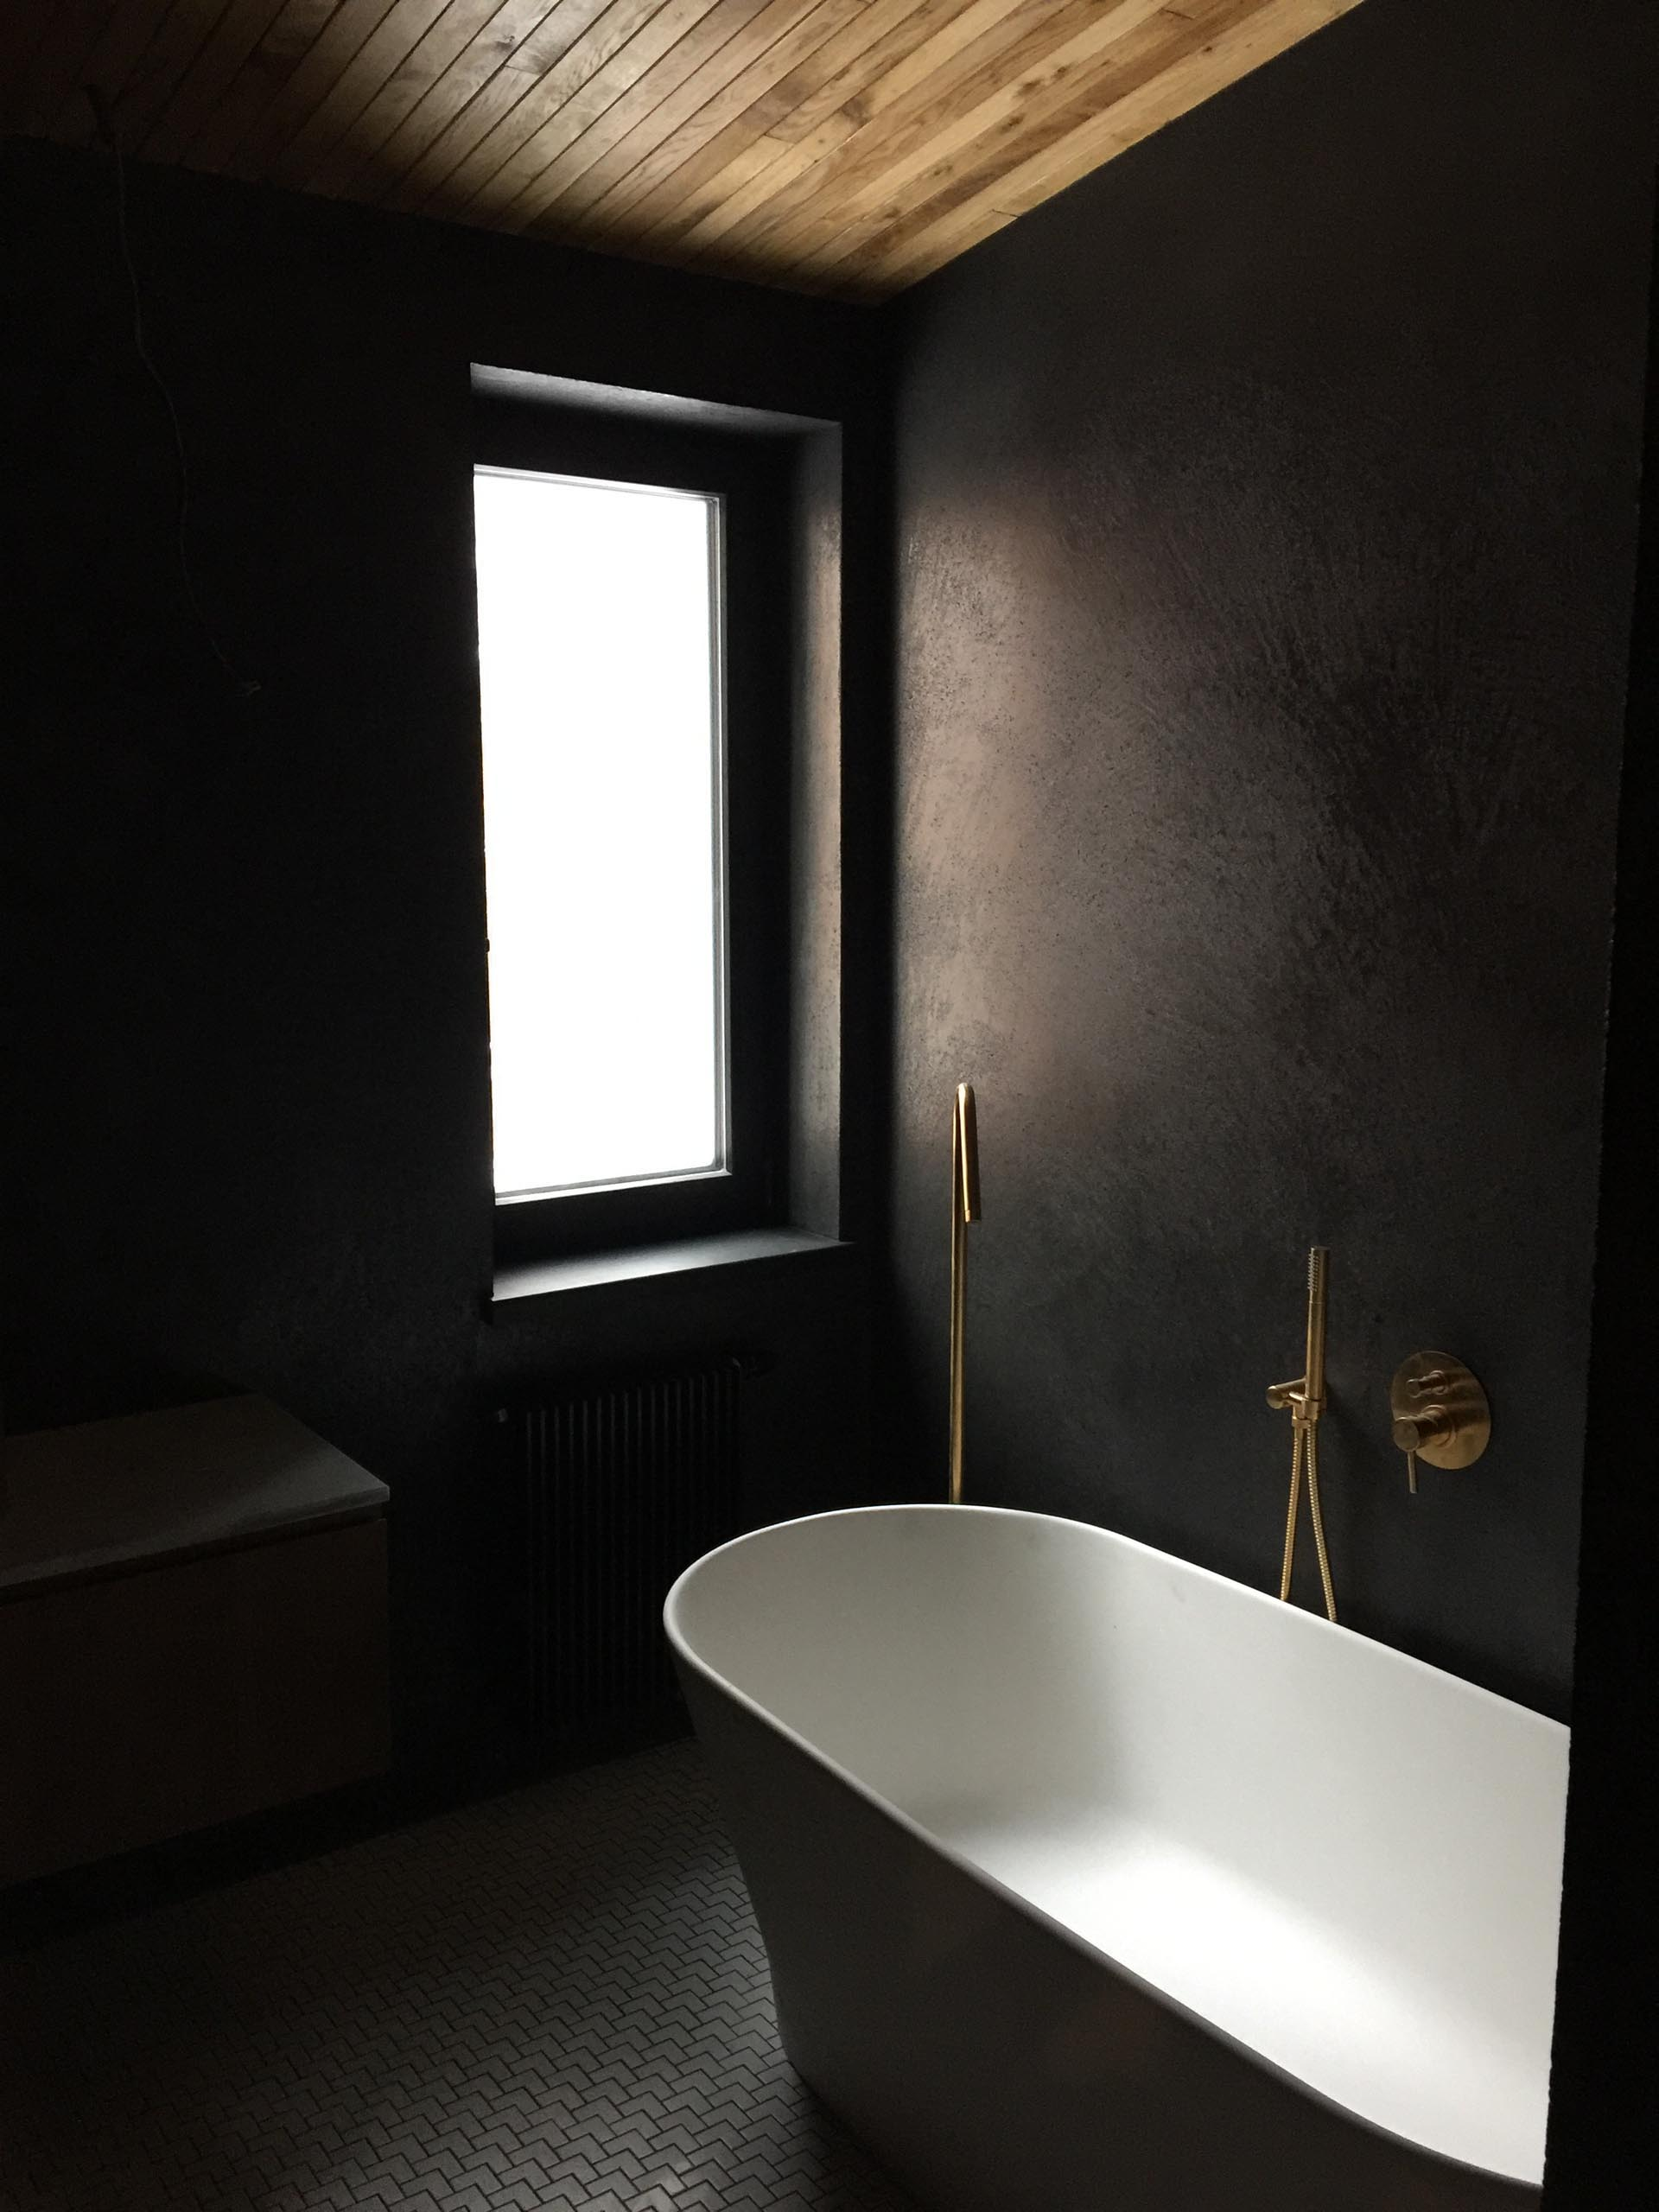 A modern bathroom with black walls, white bathtub, and gold hardware.